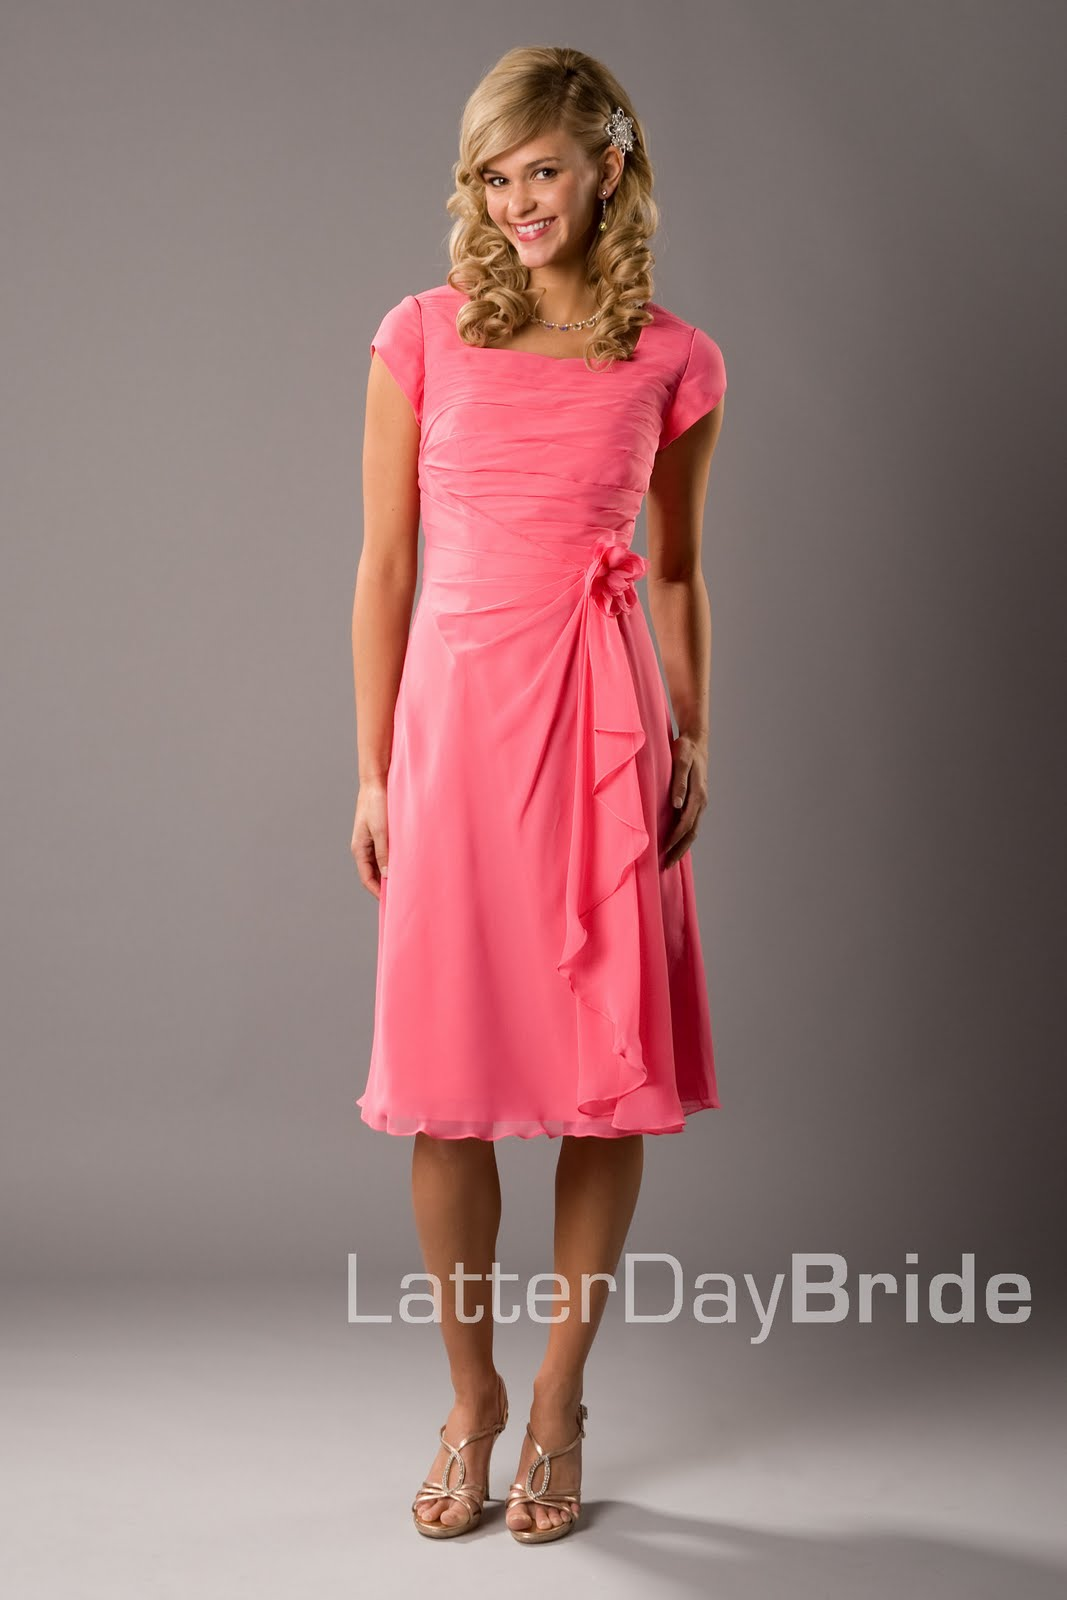 The christian wedding blog for Latter day bride wedding dresses